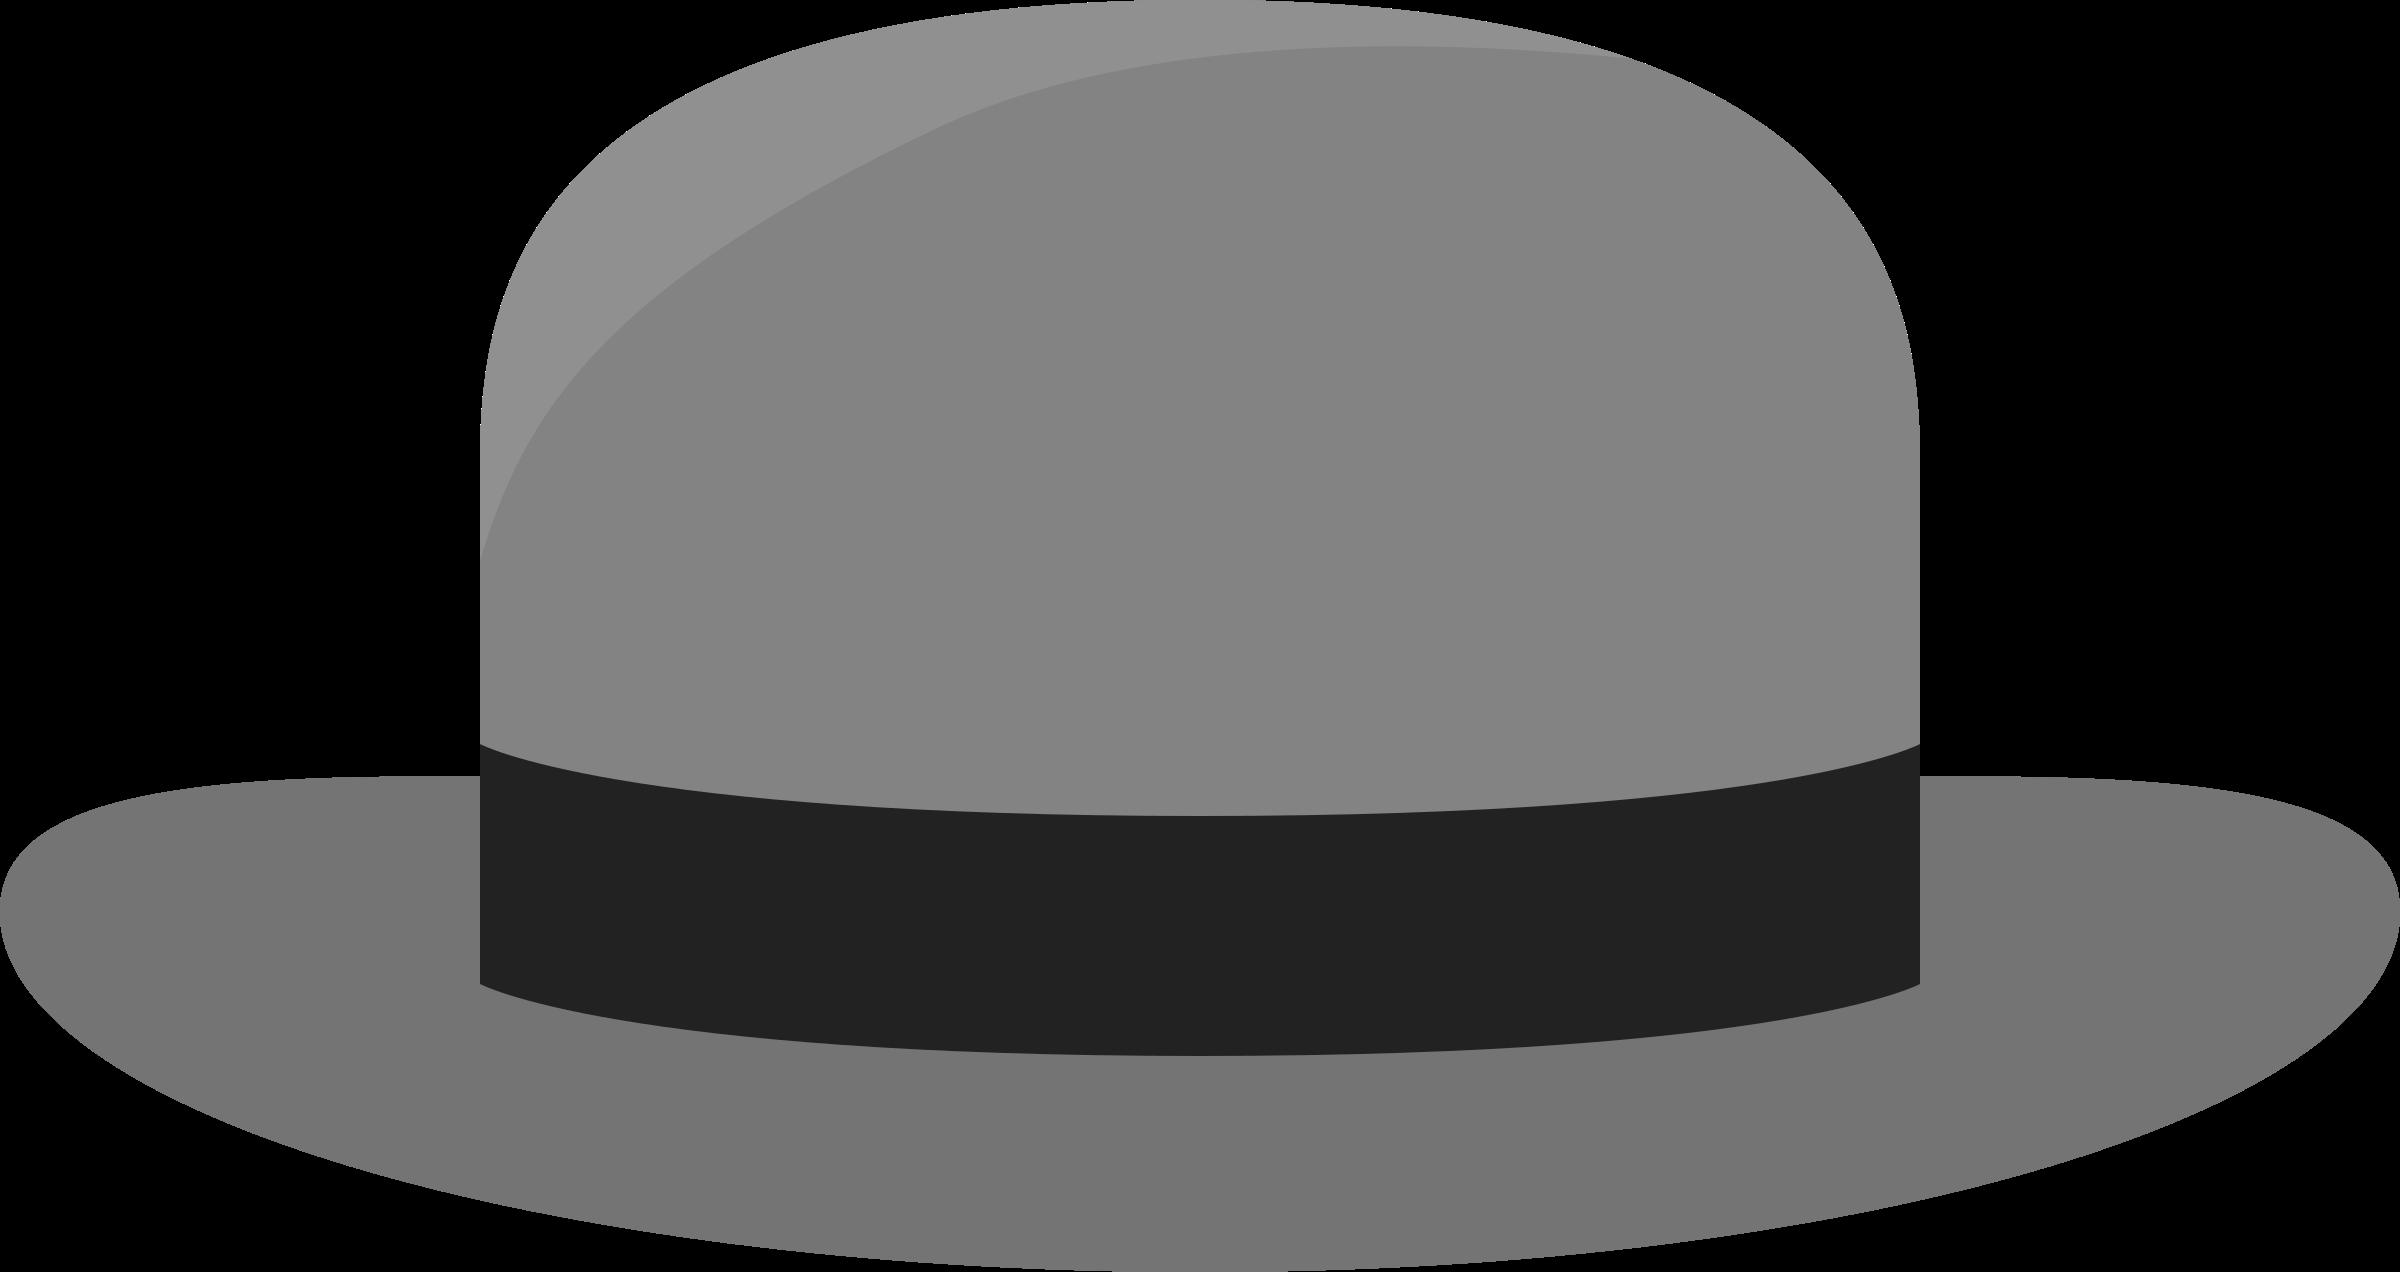 Bowler big image png. Fedora clipart grey hat